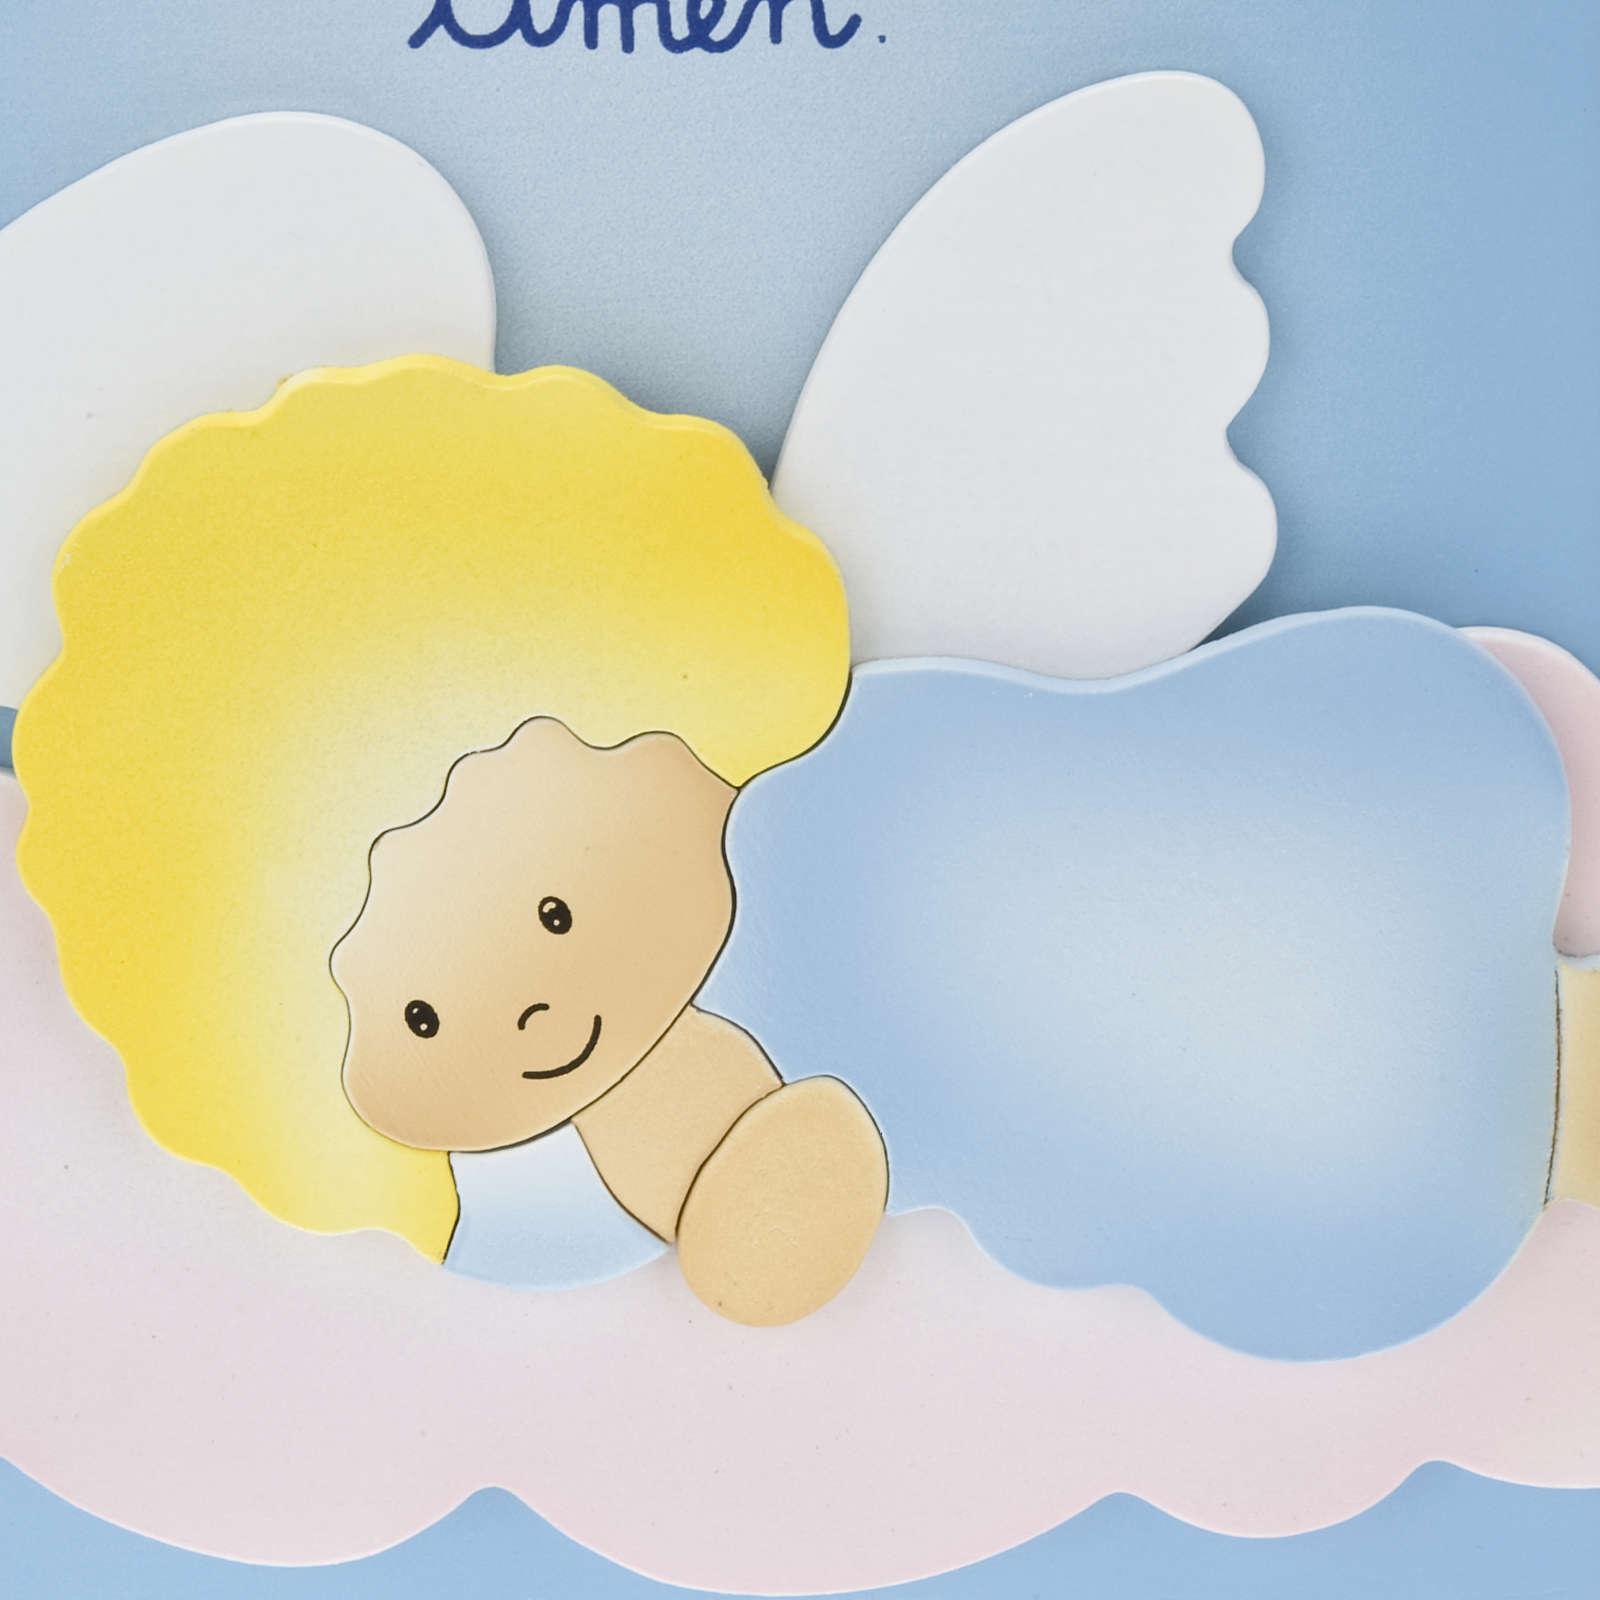 Pala bassorilievo Angelo di Dio su nuvola 4